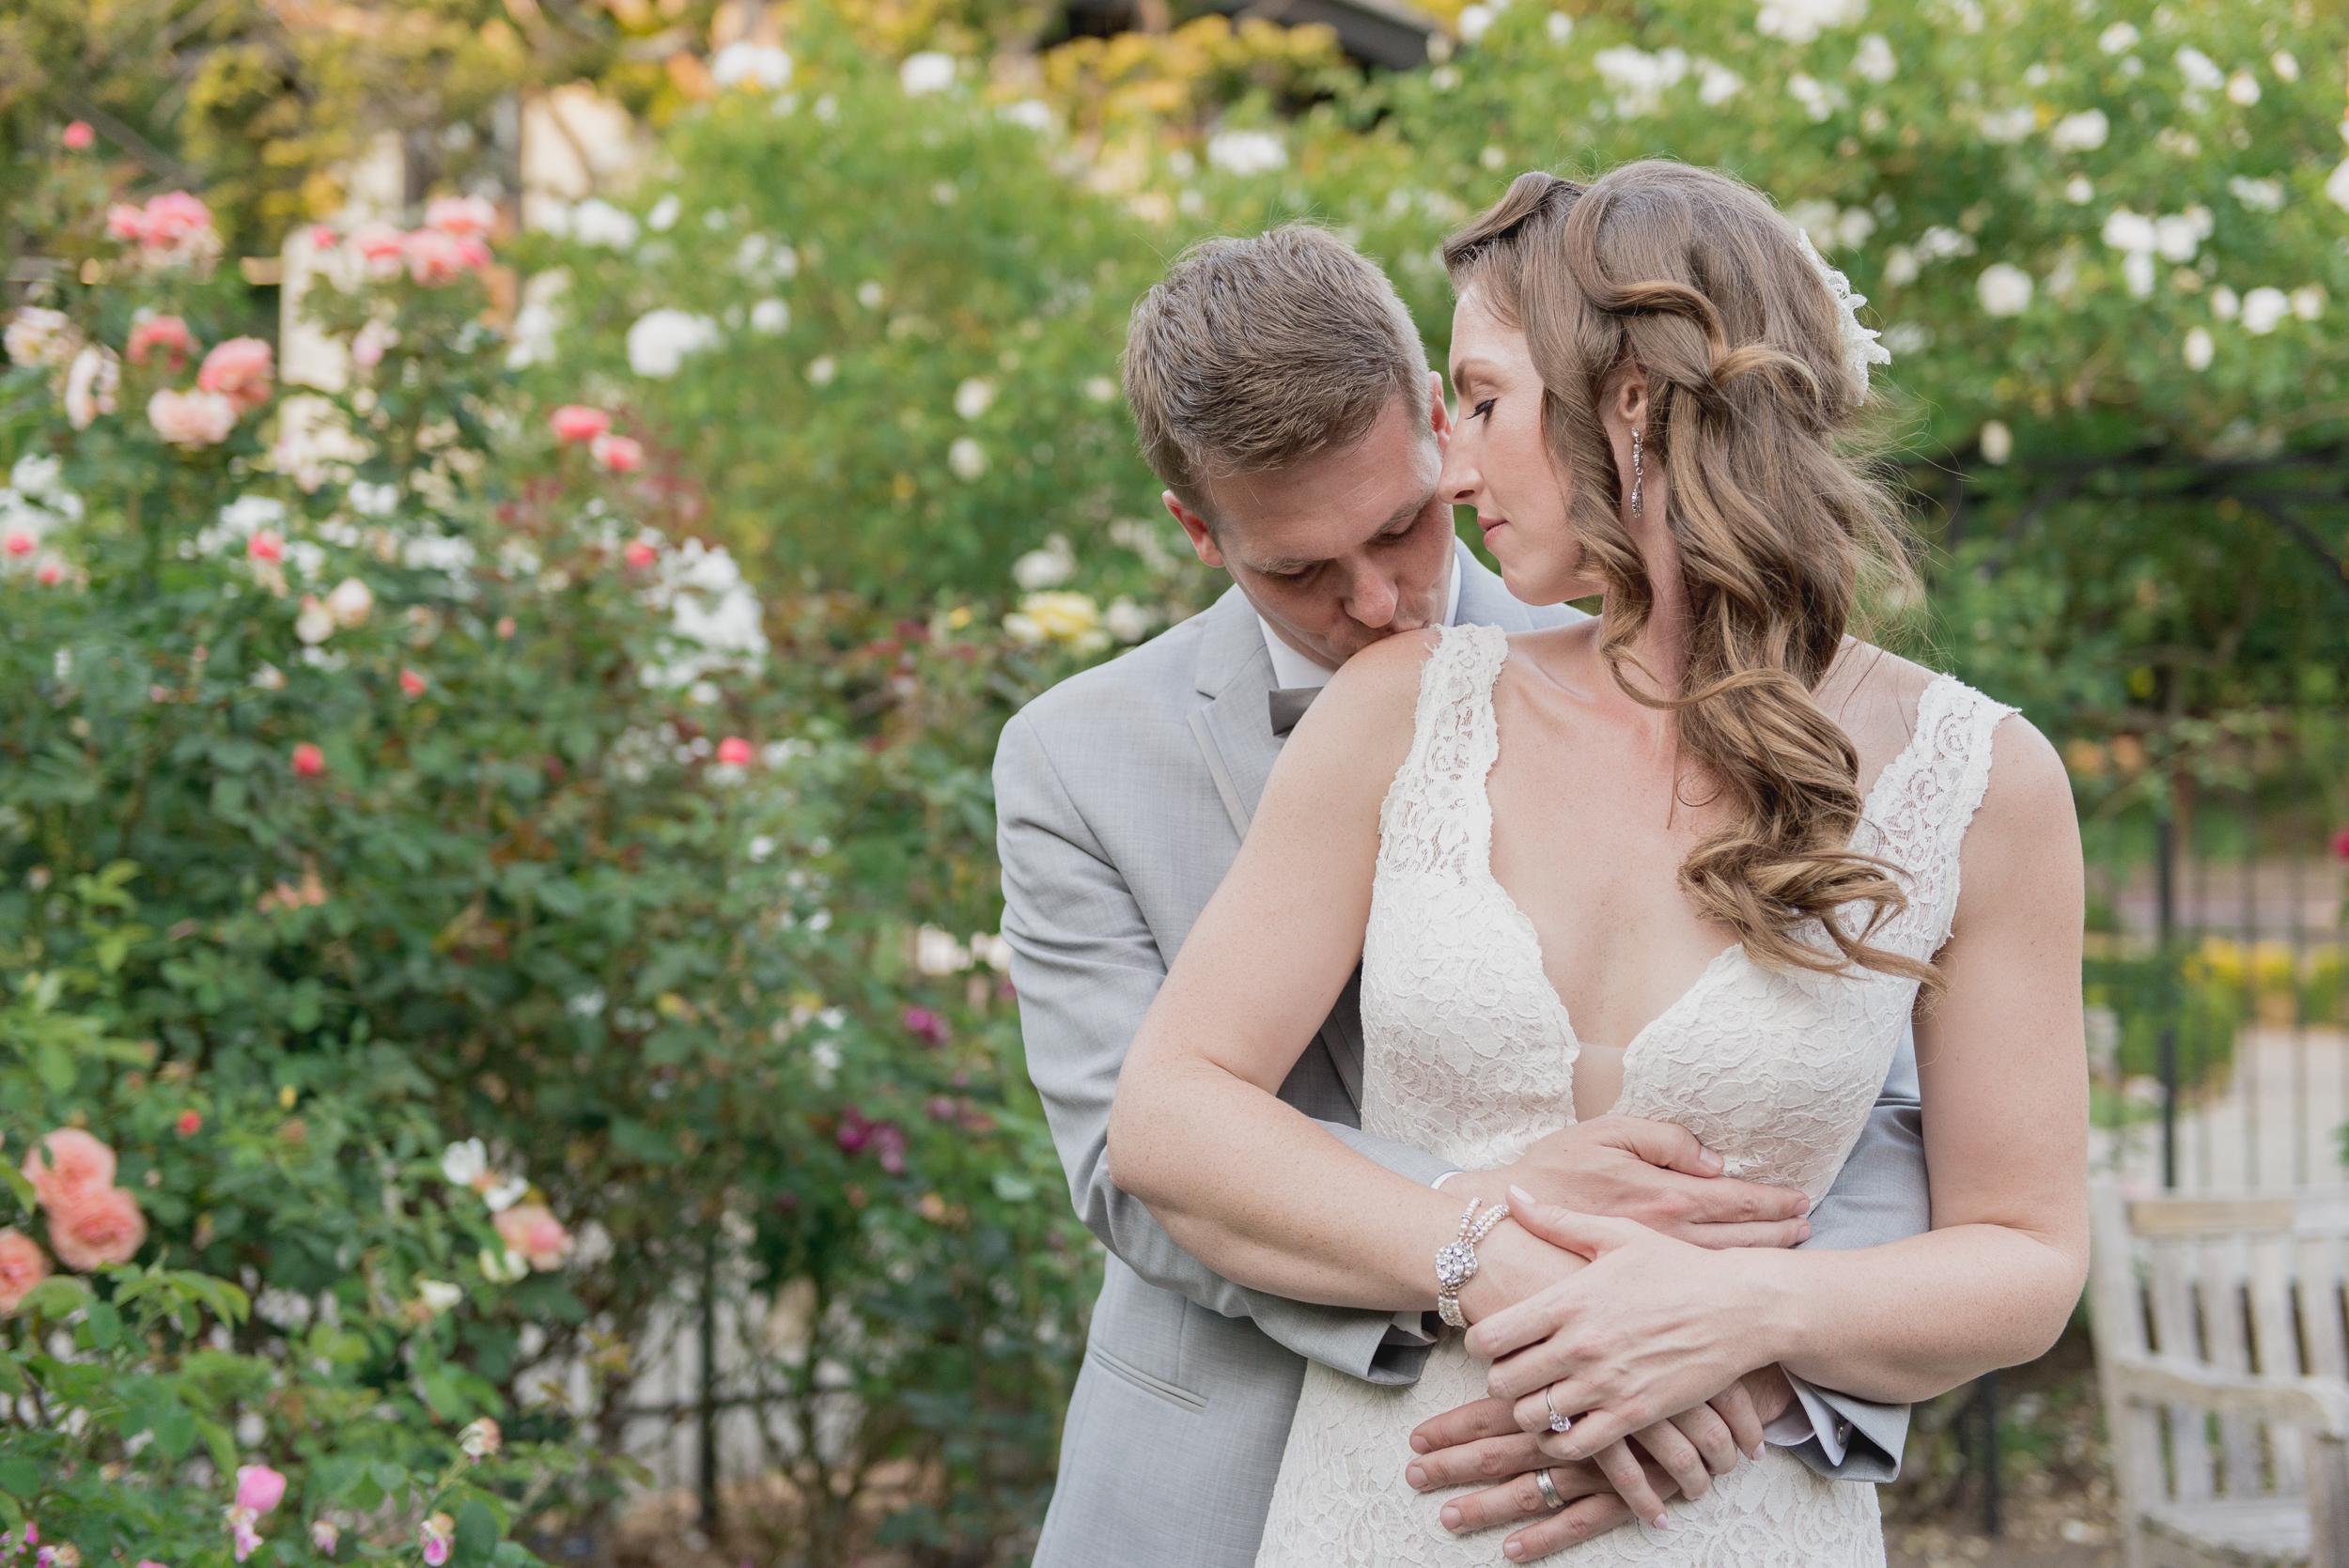 49-down-to-earth-marin-art-garden-center-wedding-vivianchen.jpg